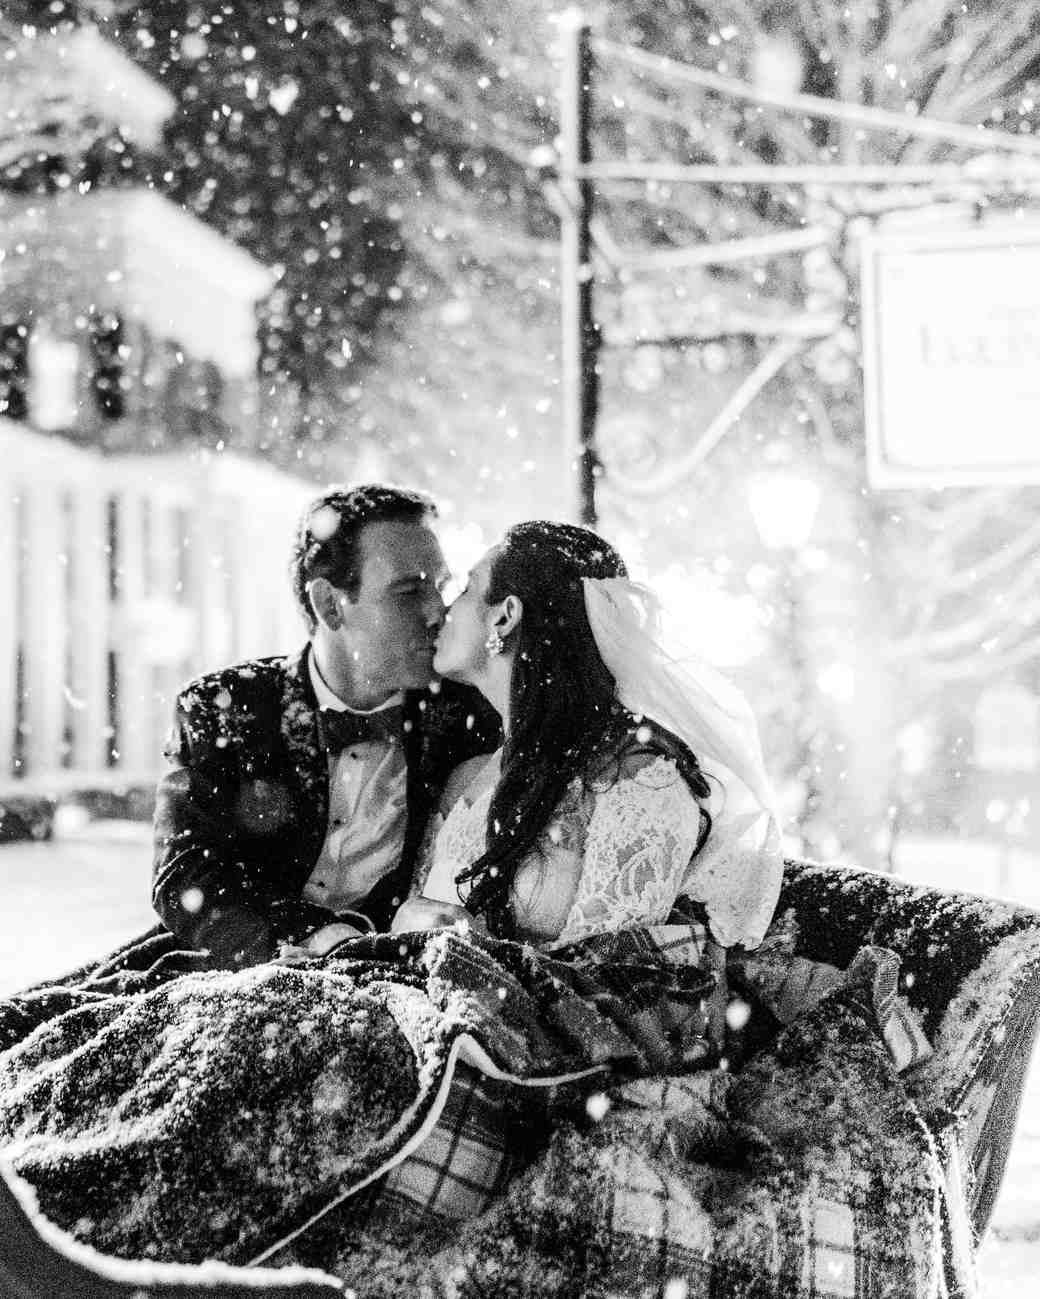 lauren christian christmas wedding carriage ride bride groom snowing